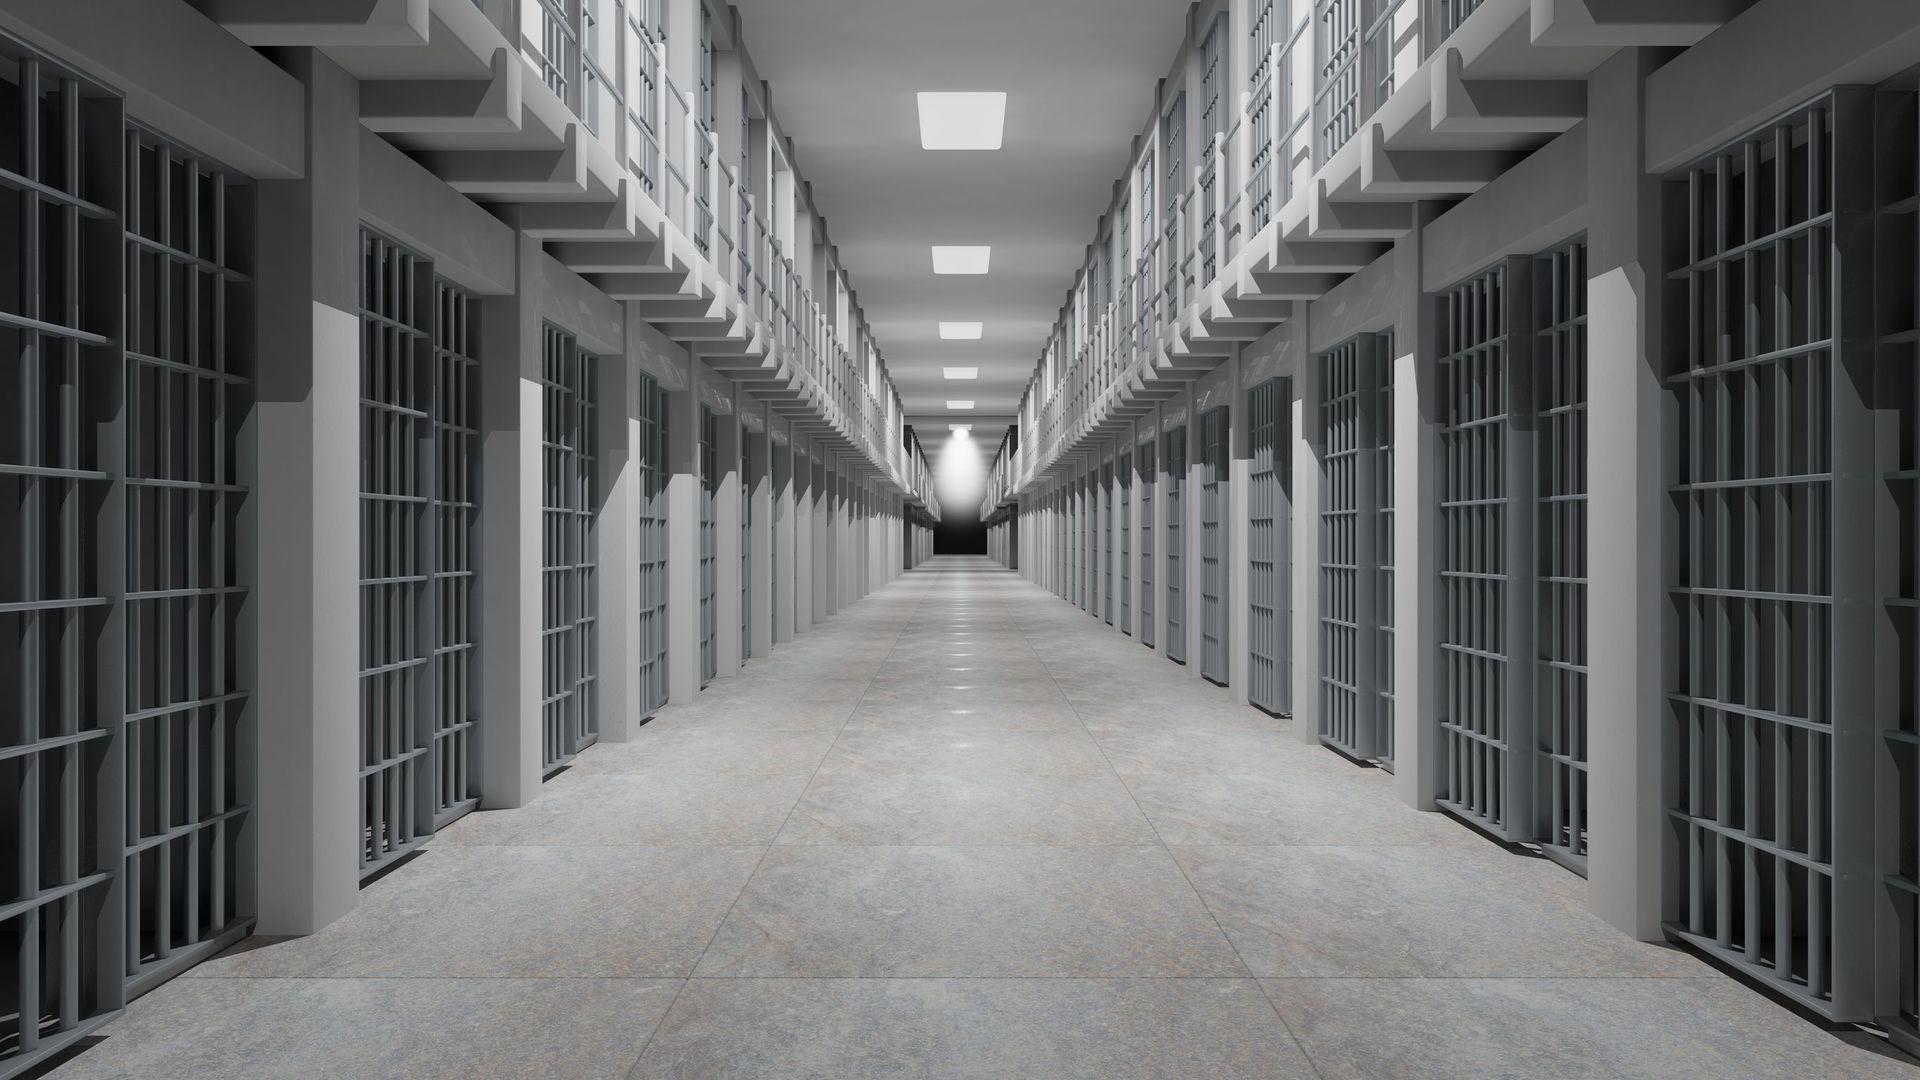 Man impregnates daughter: Jail for incest, but no sex offender treatment